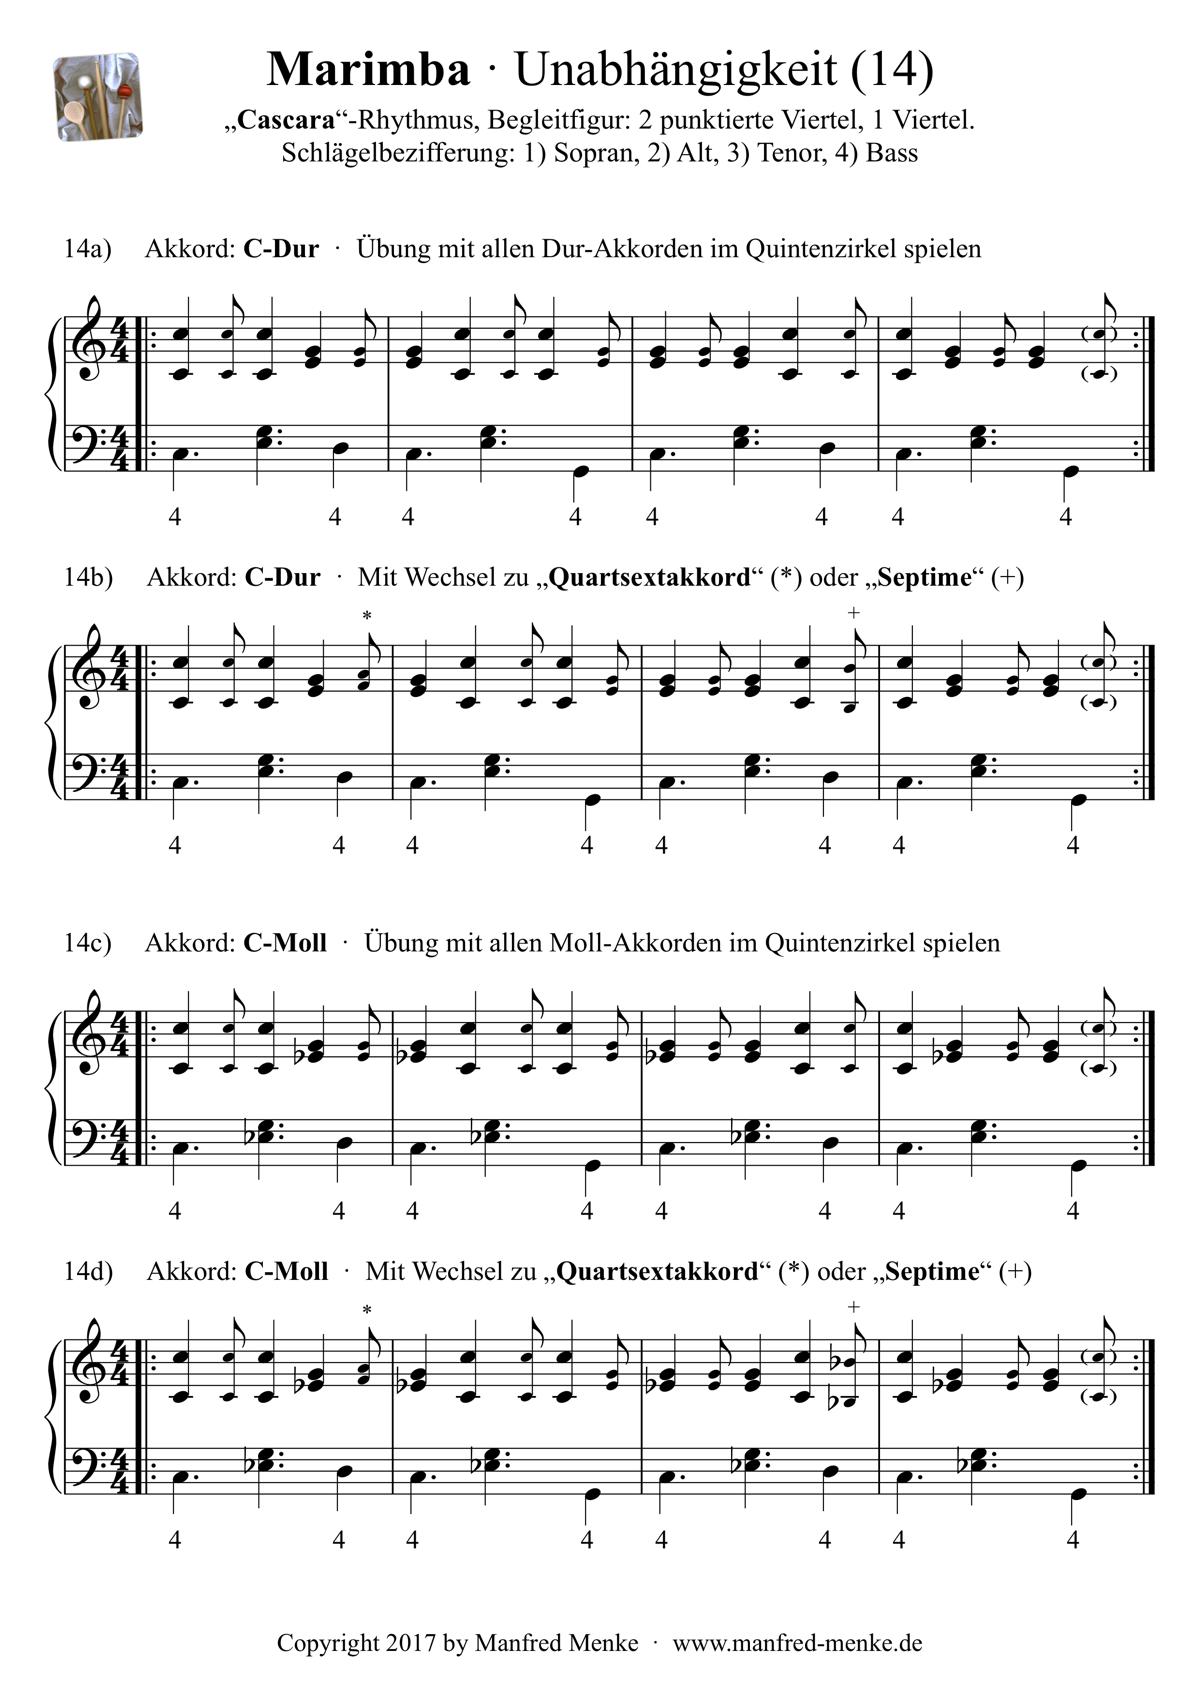 Marimba · Unabhaengigkeit (Seite 14)